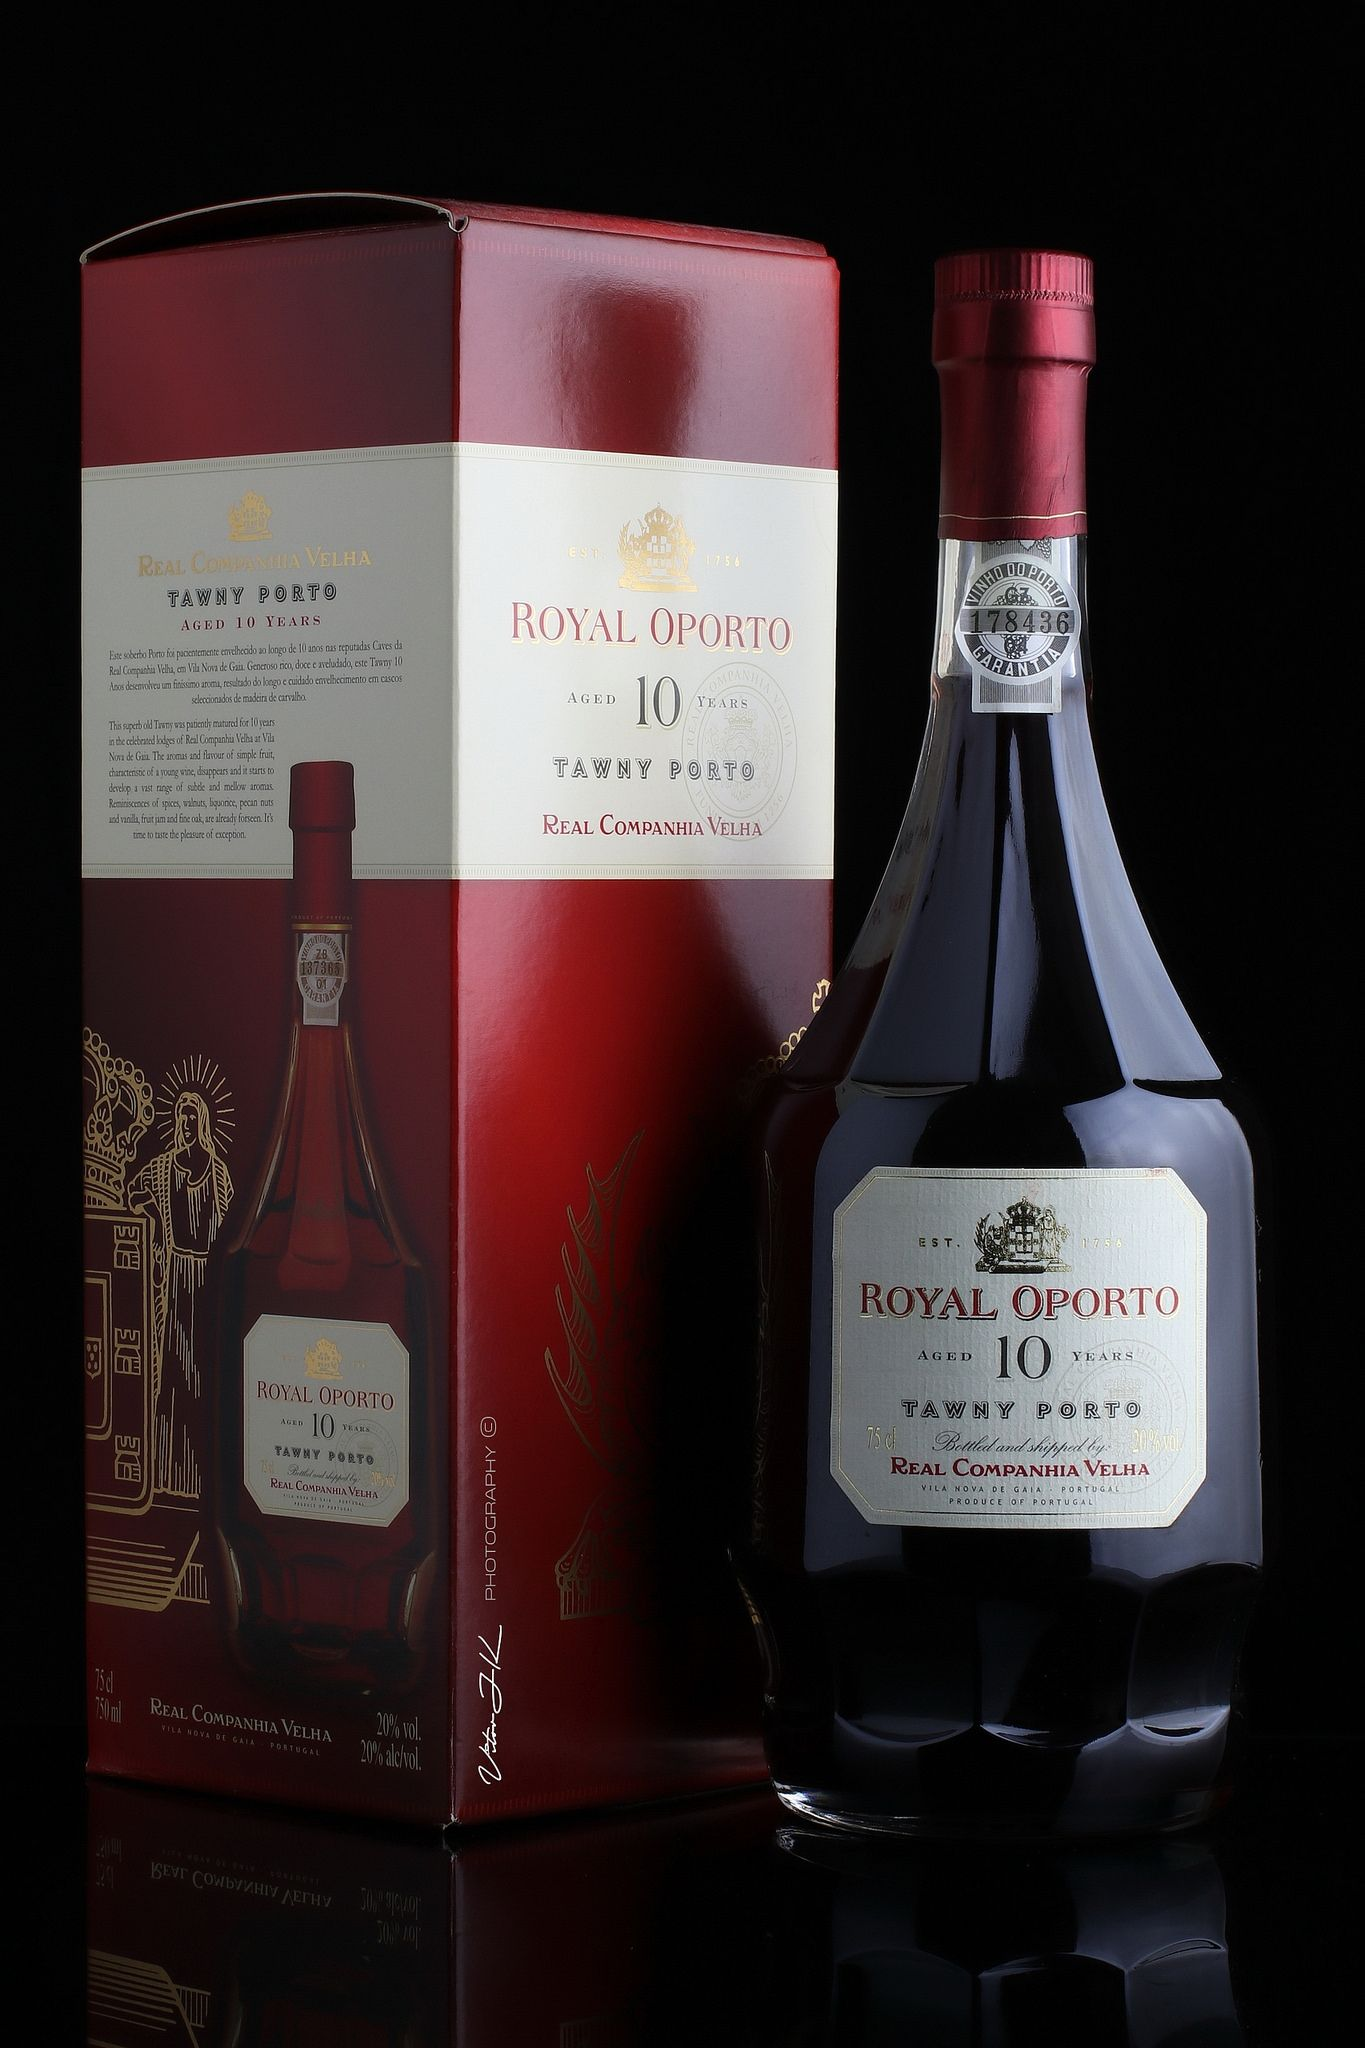 Royal Oporto Aged 10 Years Tawny Porto Real Companhia Velha Porto Age 10 10 Years